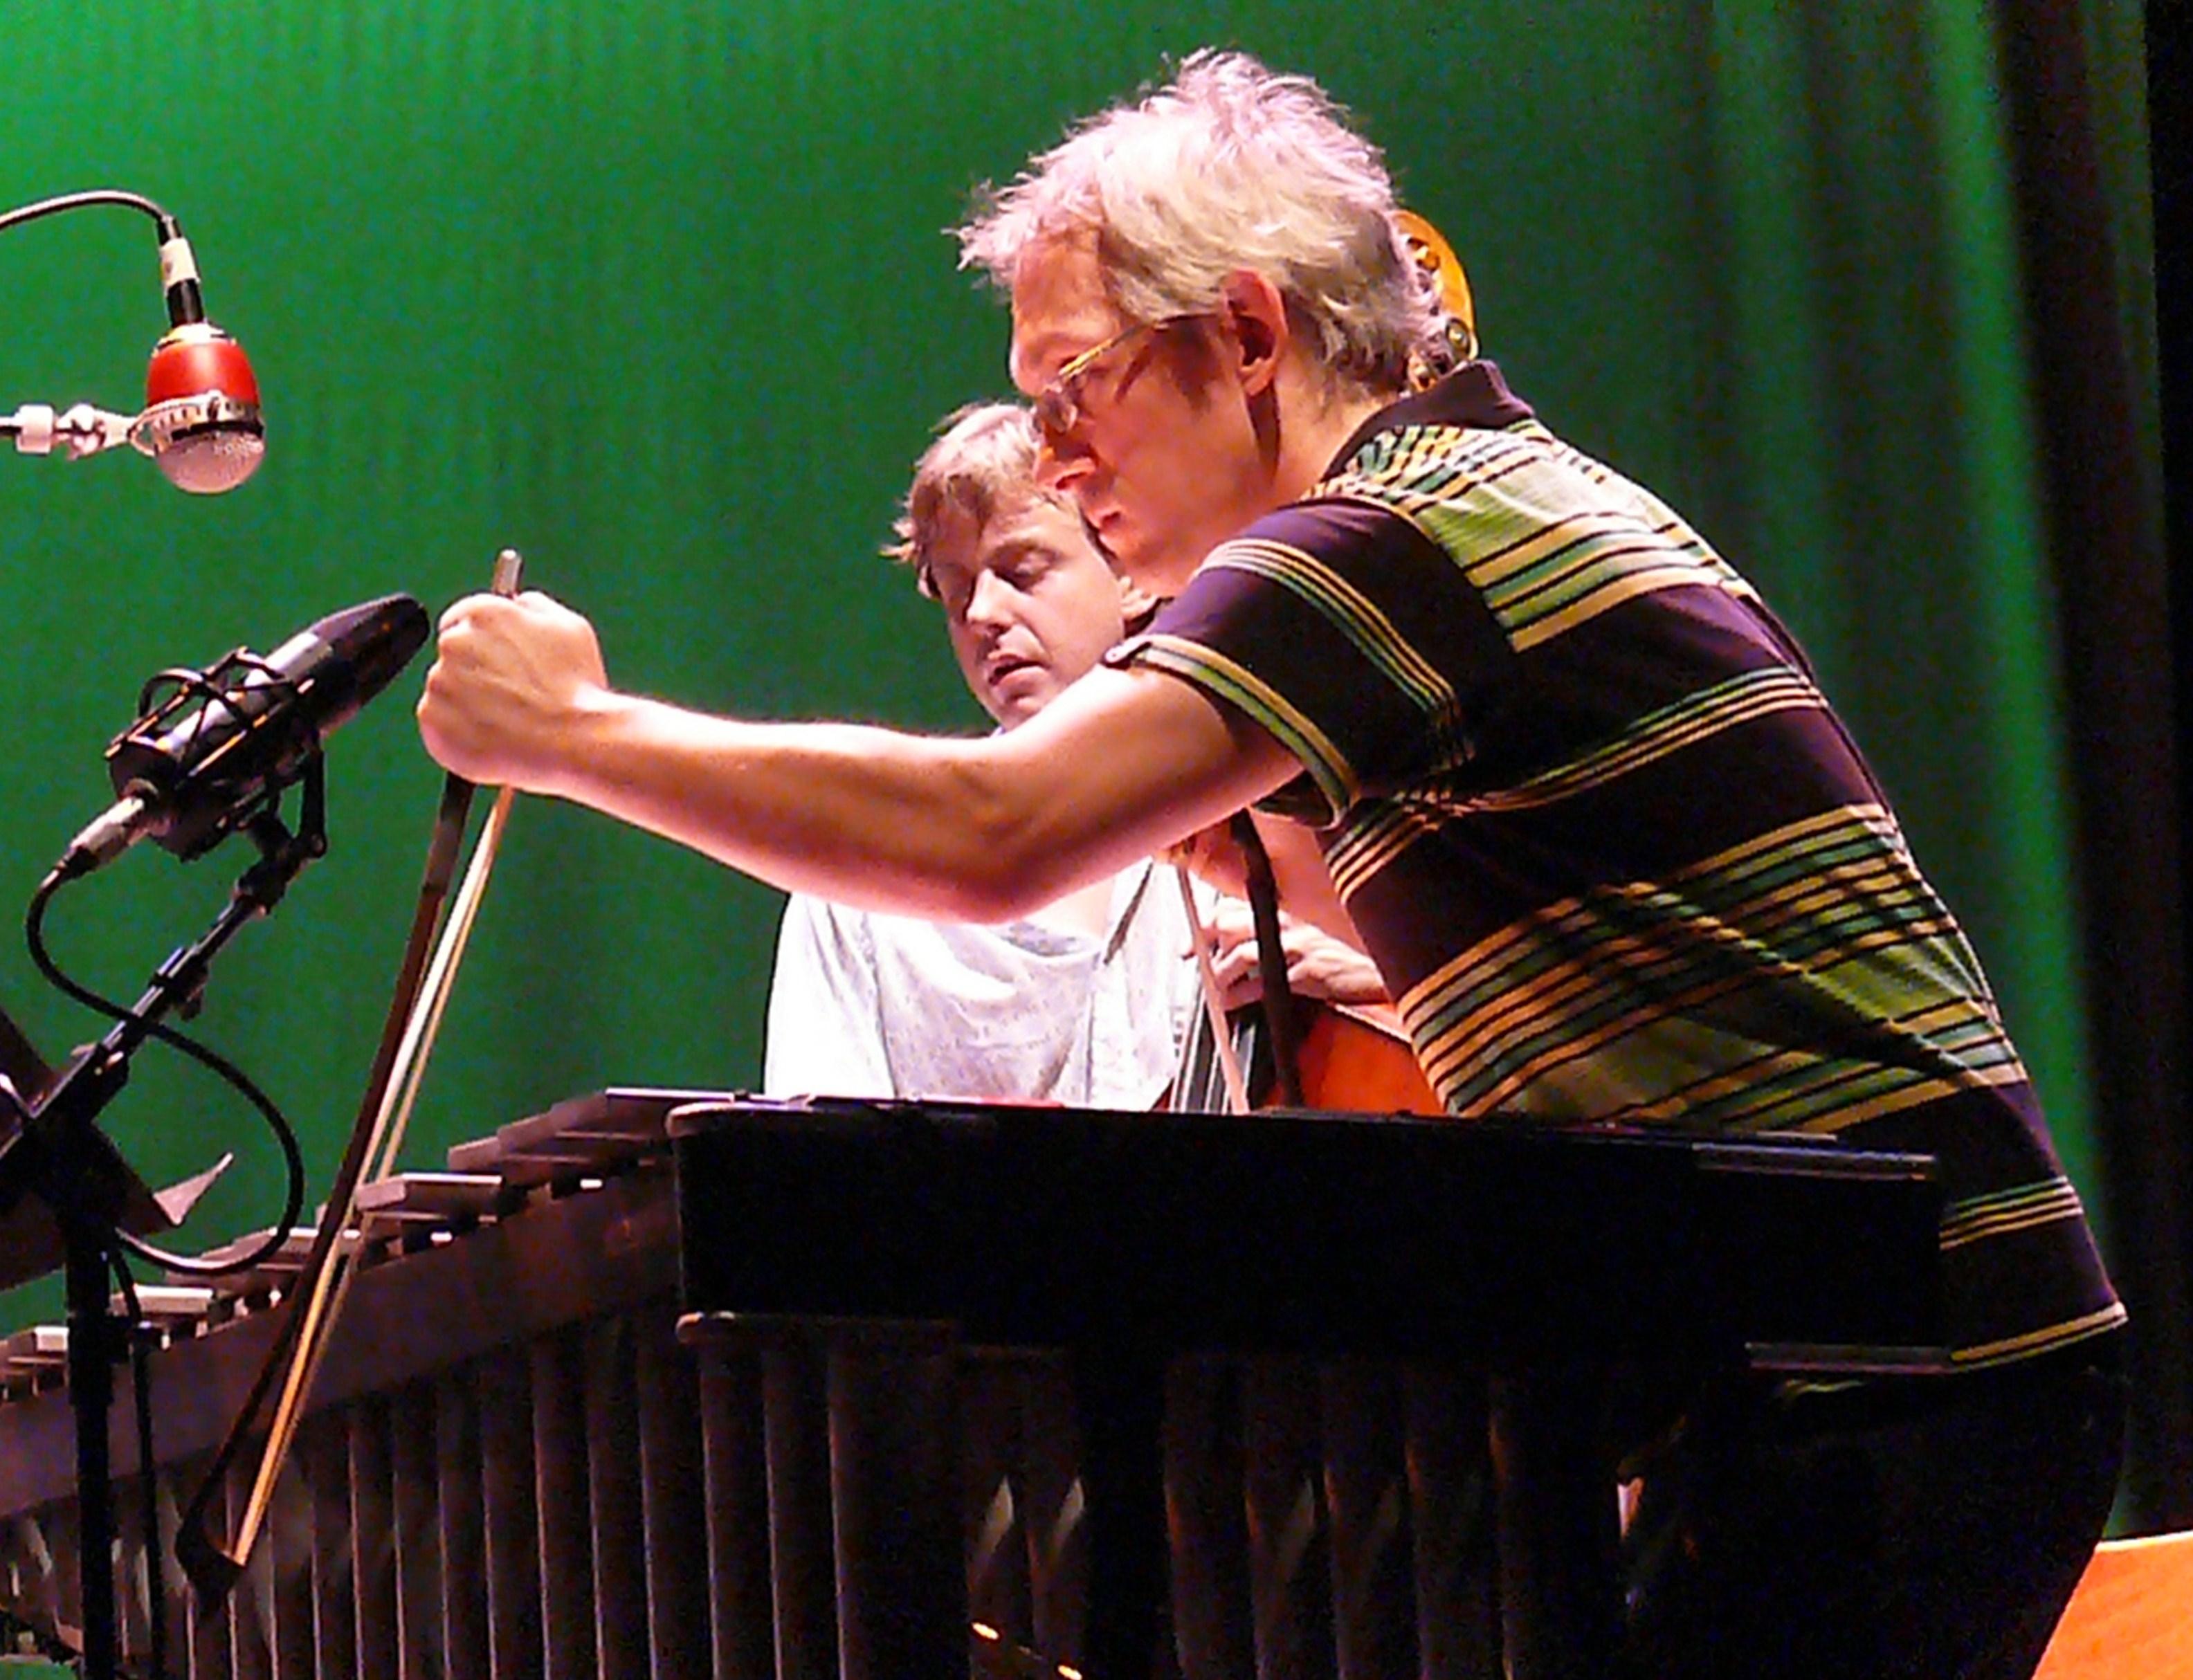 Matt Moran and Chris Lightcap at Vision Festival 2010